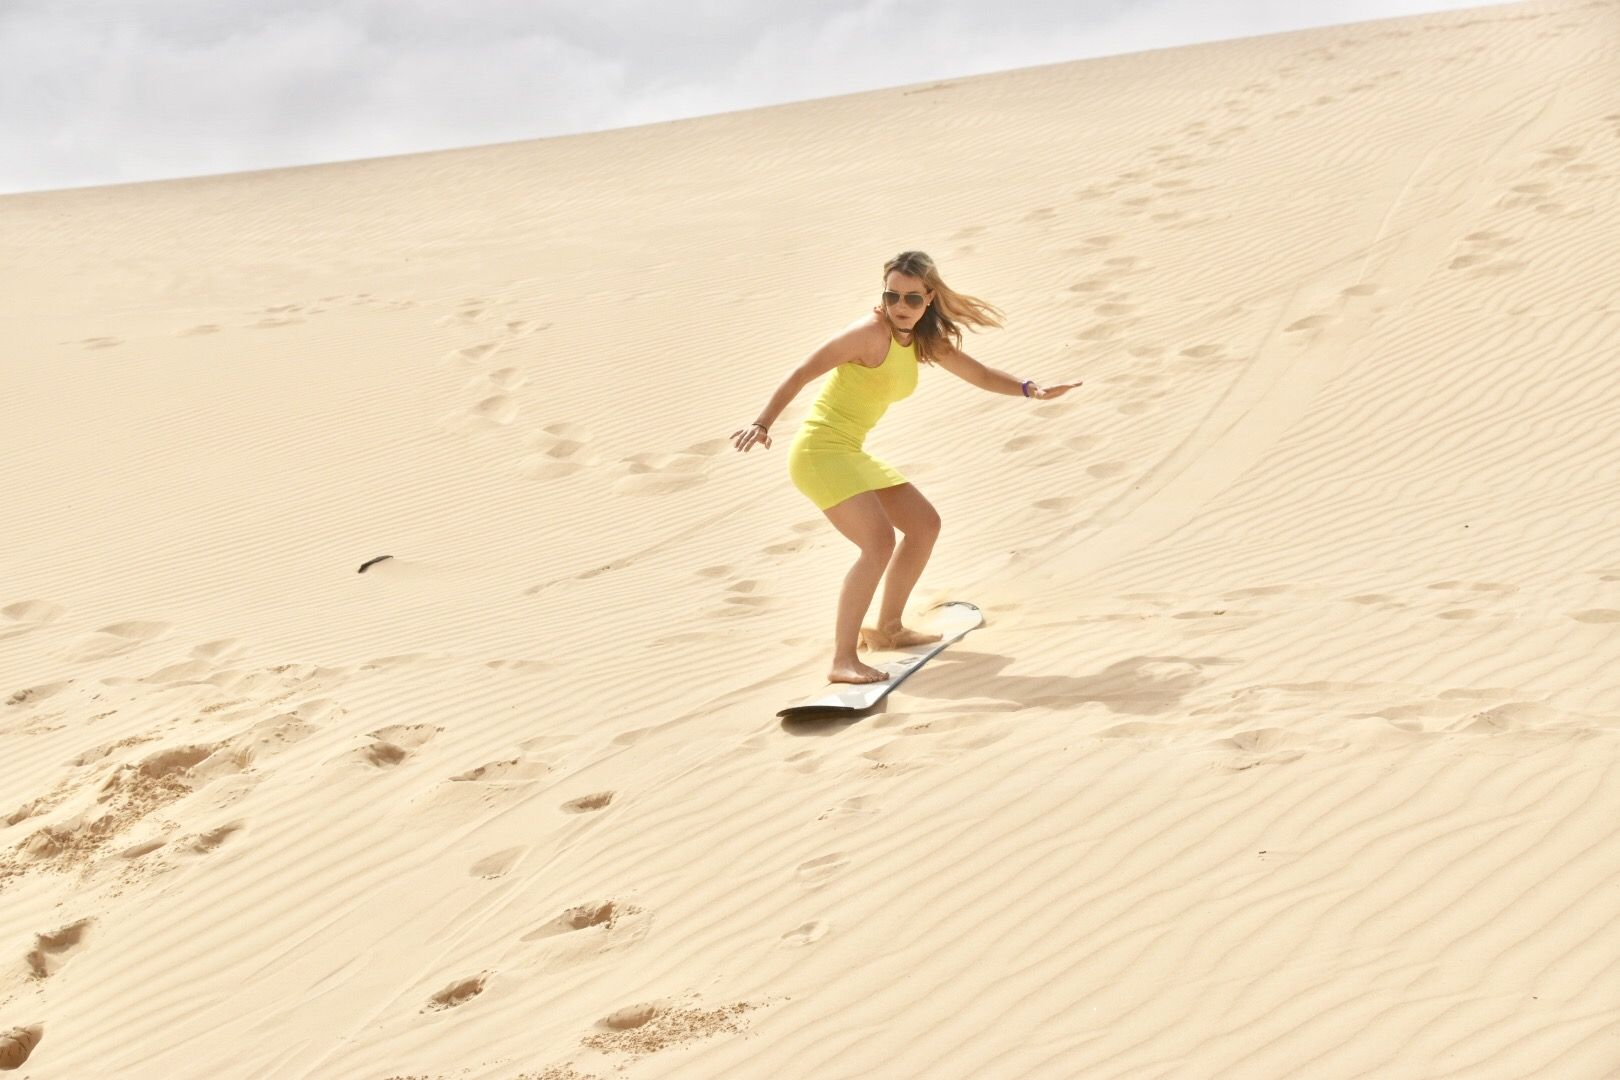 Boa Vista Cape Verde Sand Dunes Surfing Instagram